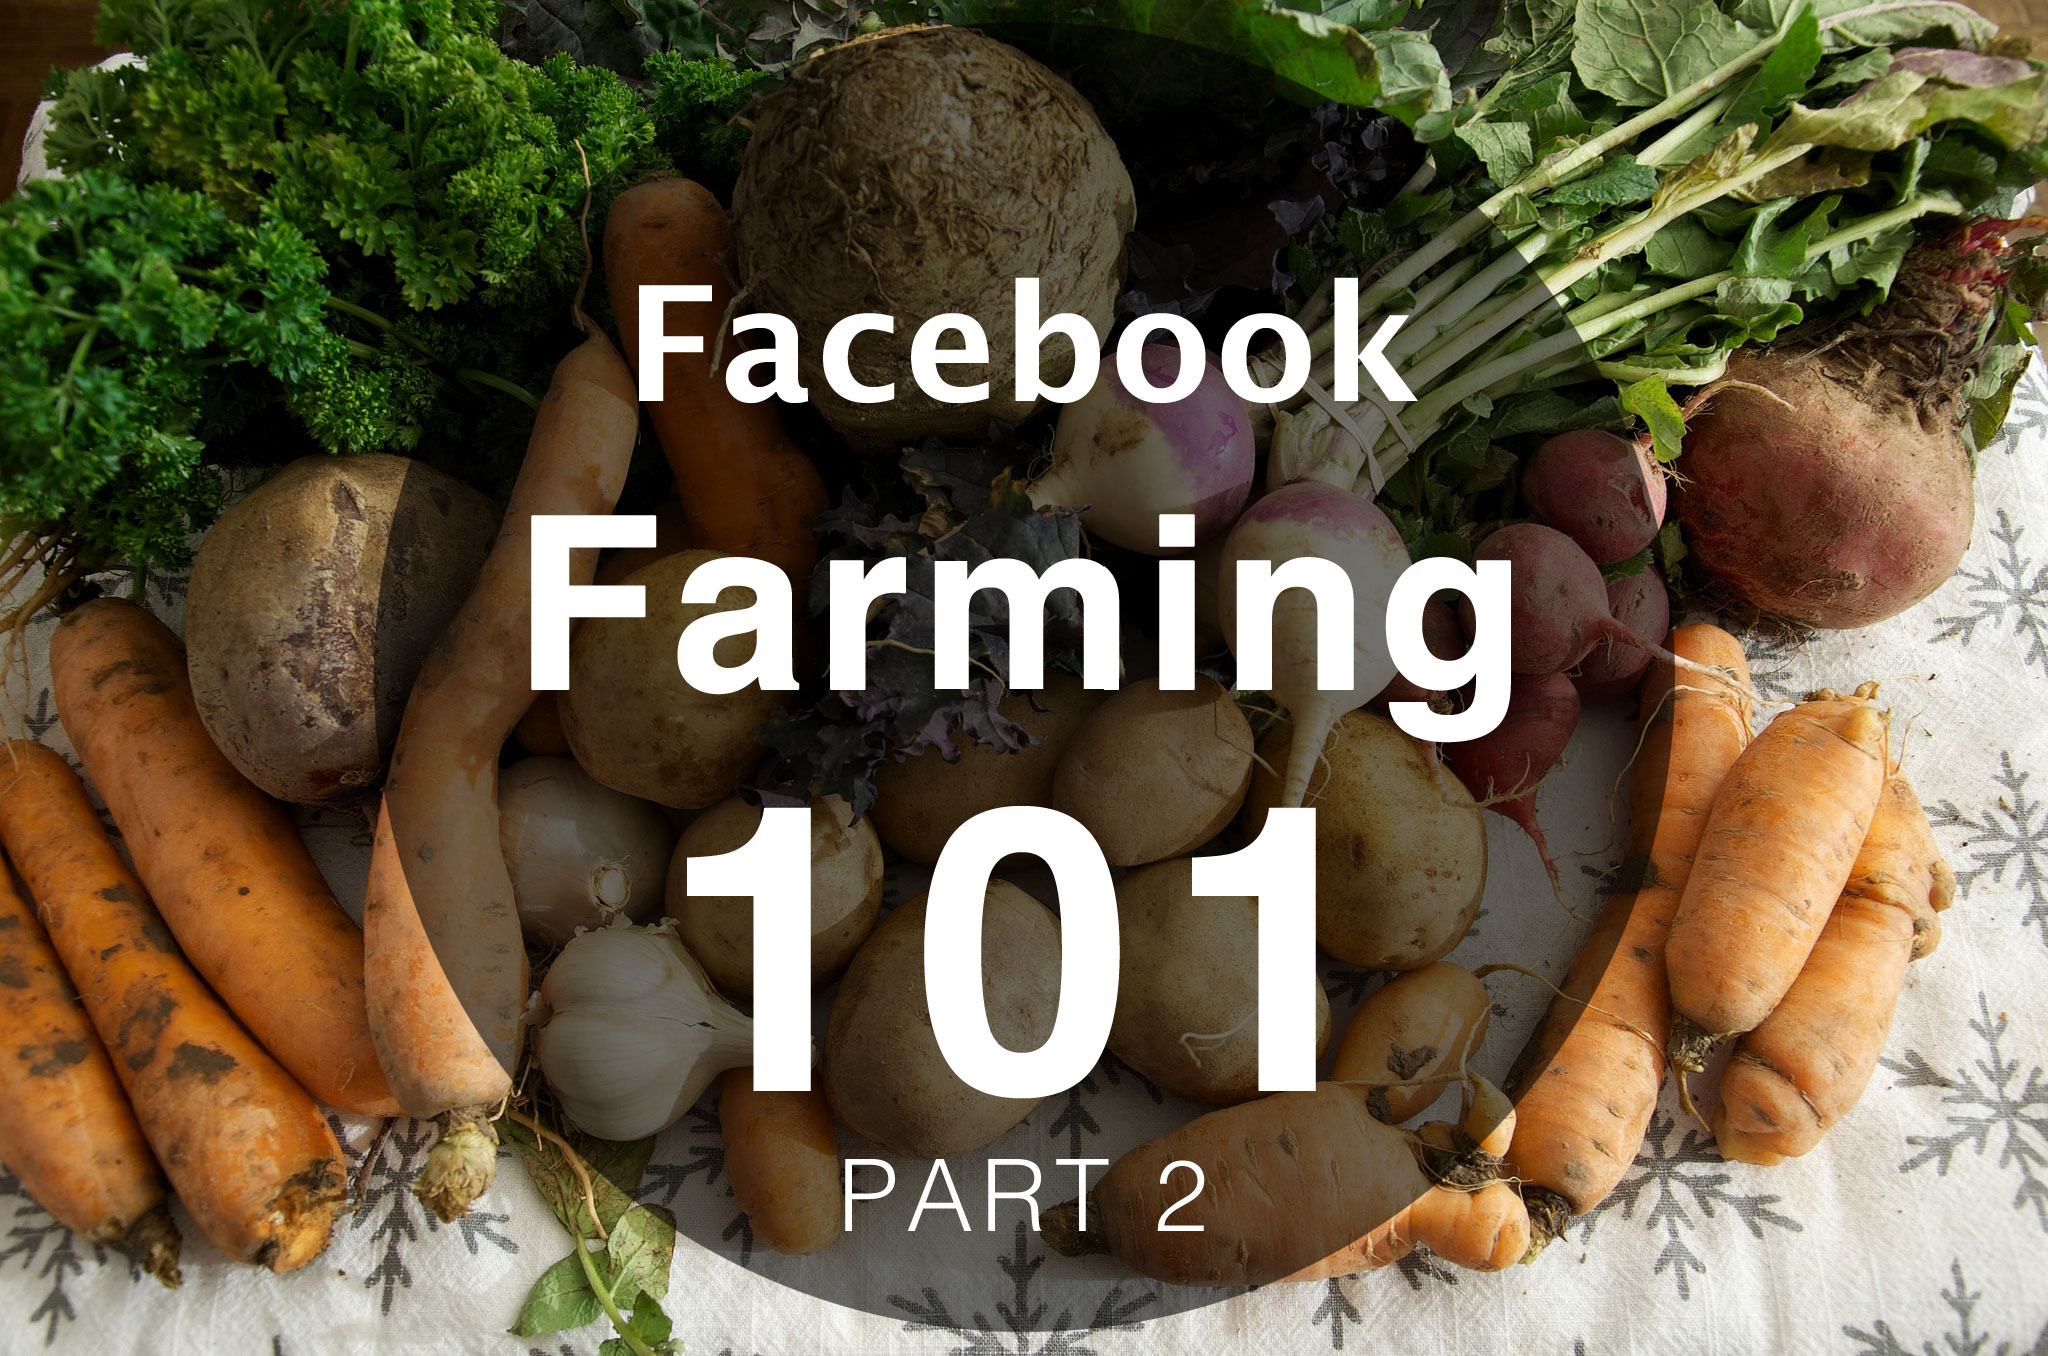 Facebook farming for Realtors 101